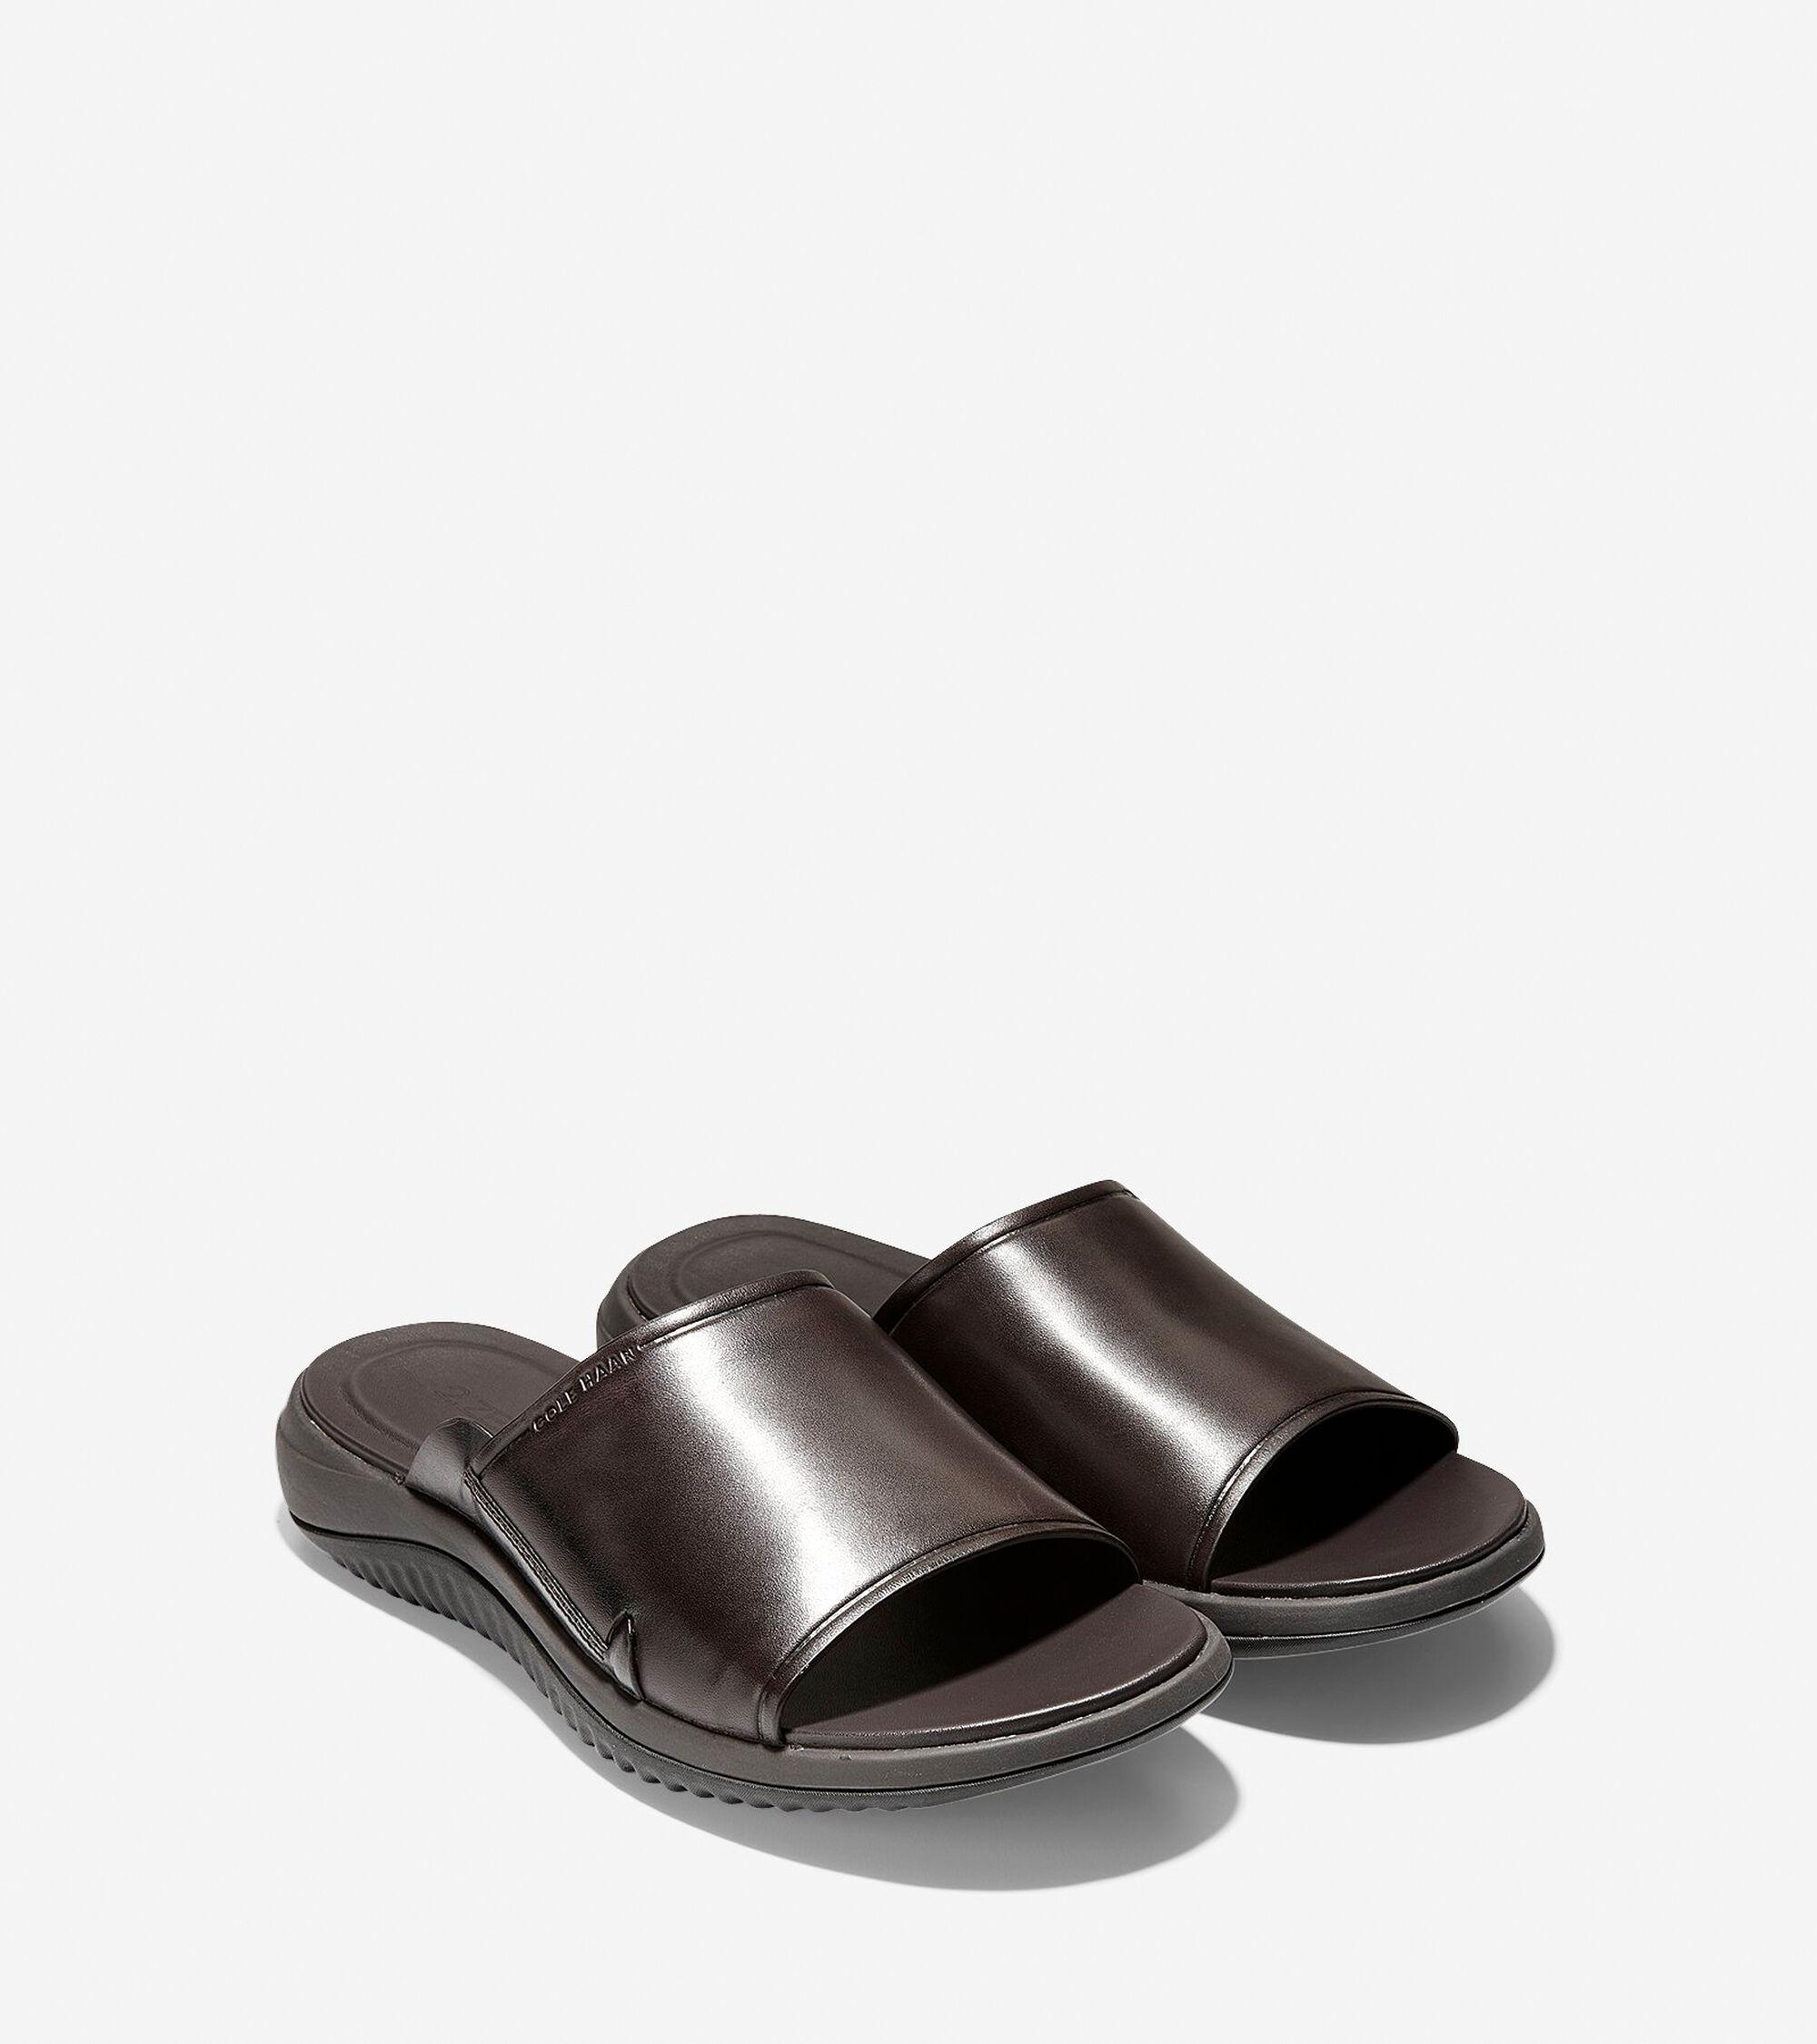 3d7e106b94df Men s 2.ZEROGRAND Slide Sandals in Dark Roast